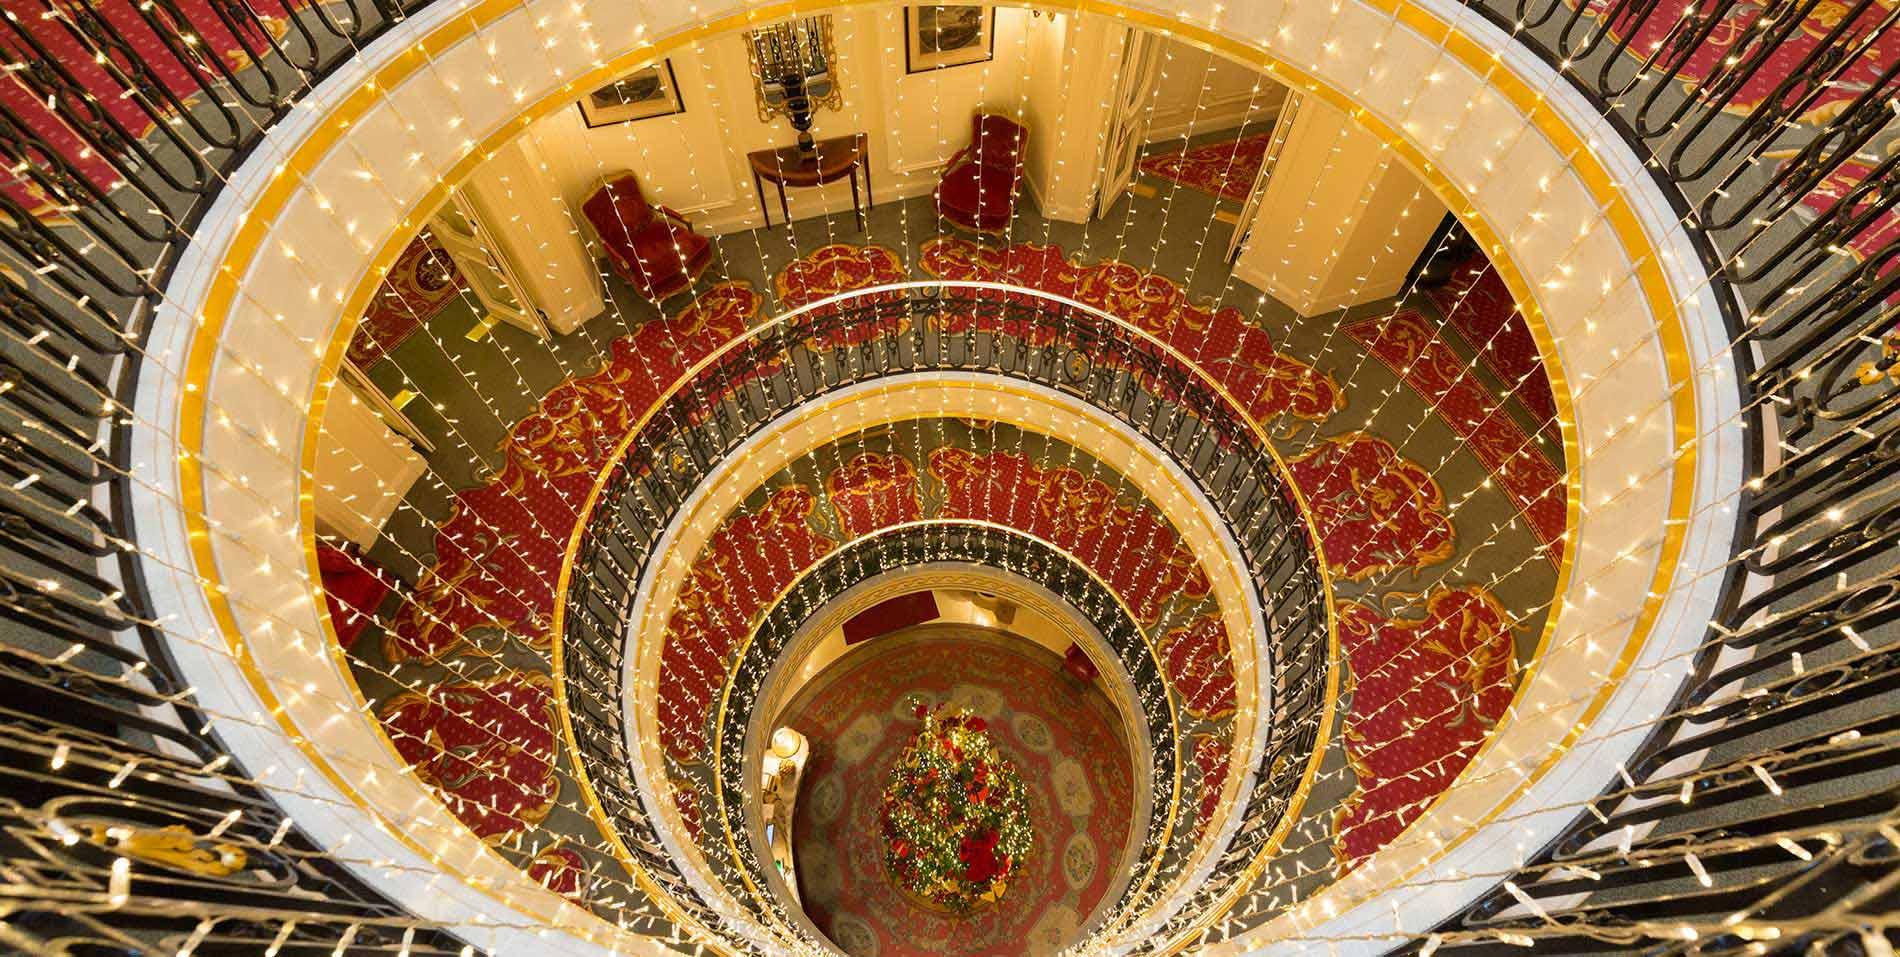 Rotunda Christmas lights